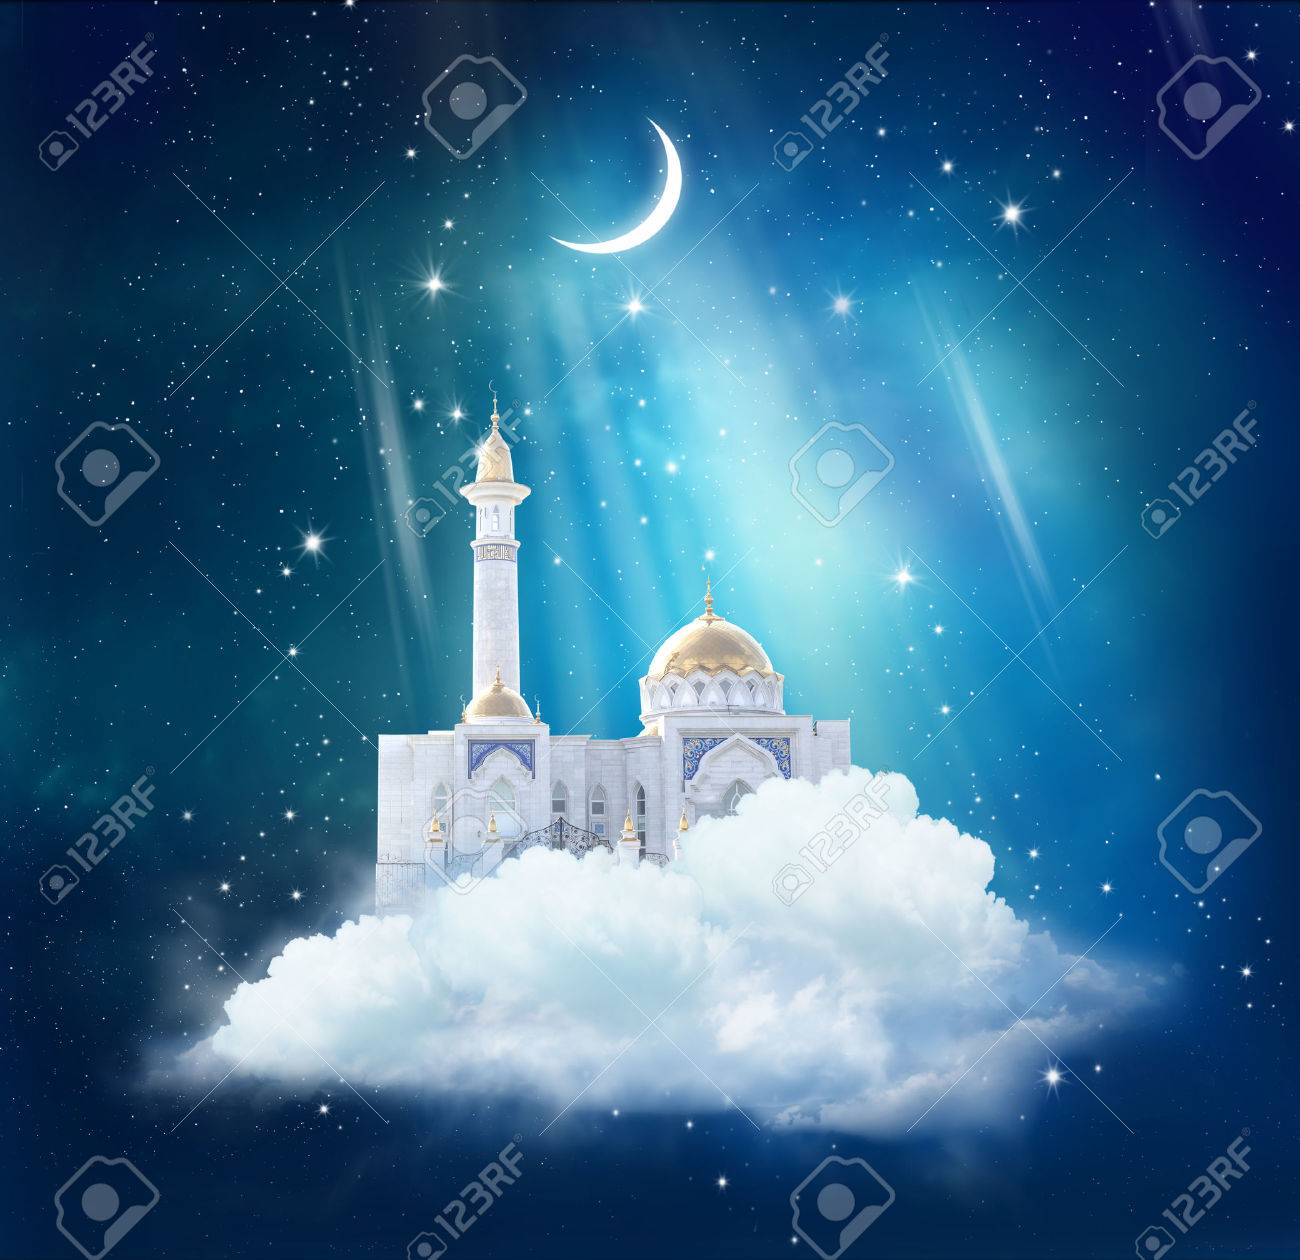 Mosque background for ramadan kareem stock photography image - Ramadan Kareem Background With Mosque In Sky Stock Photo 76411539